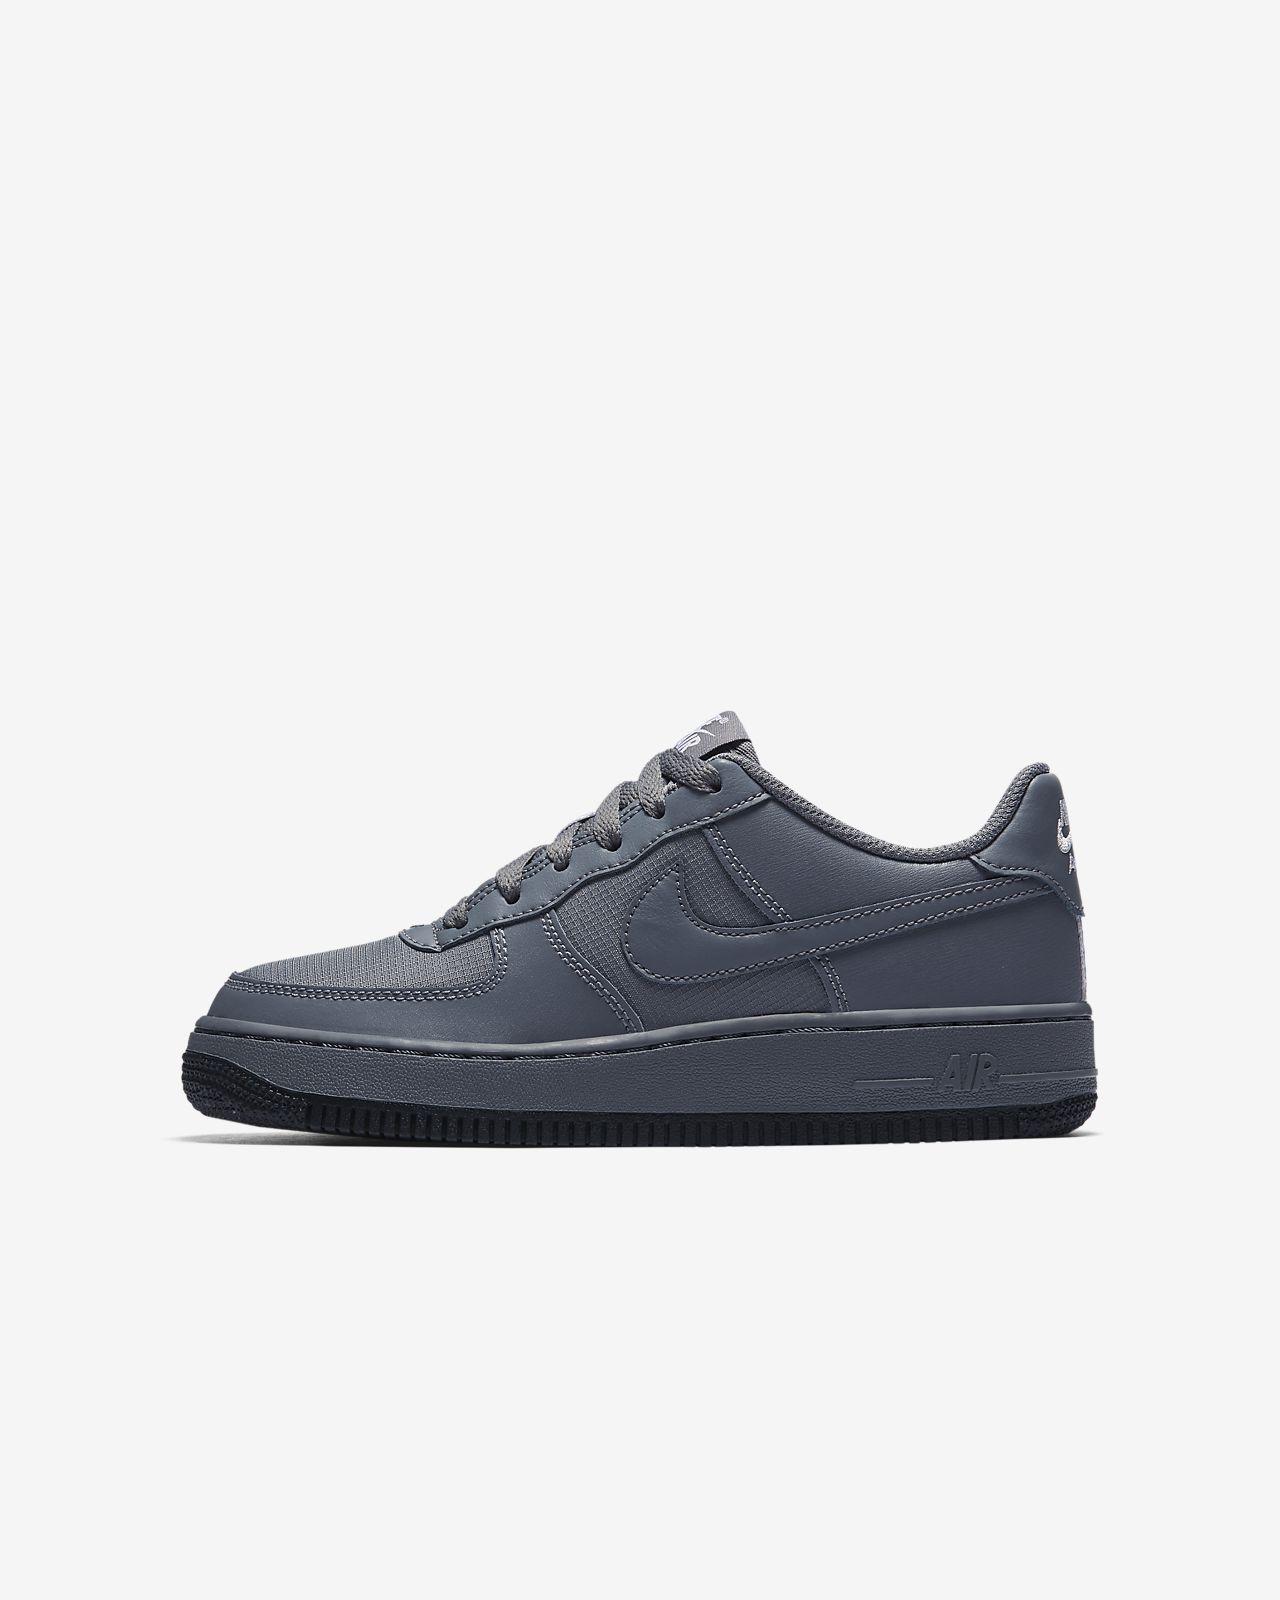 Nike Air Force 1 LV8 (820438-009) Girls Skateboarding Shoes Black/Grey